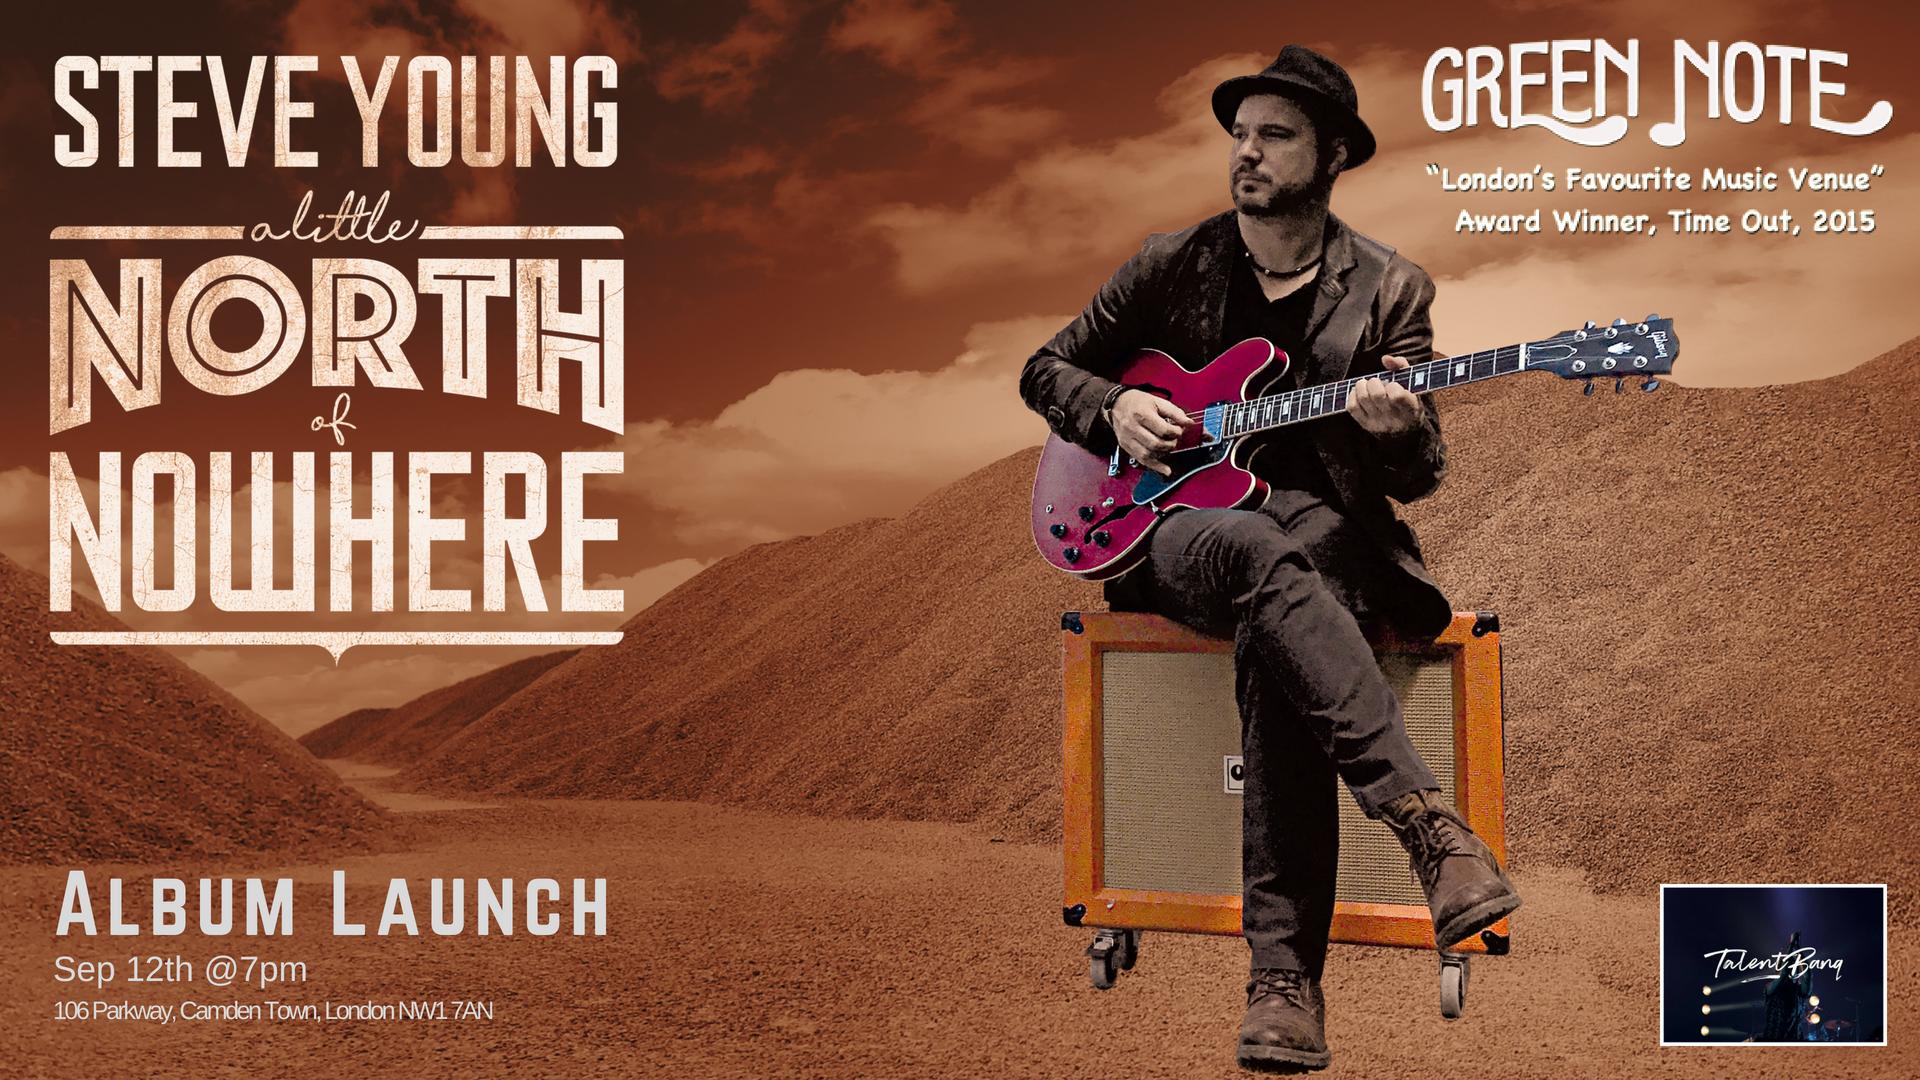 Steve Young Album Launch Party